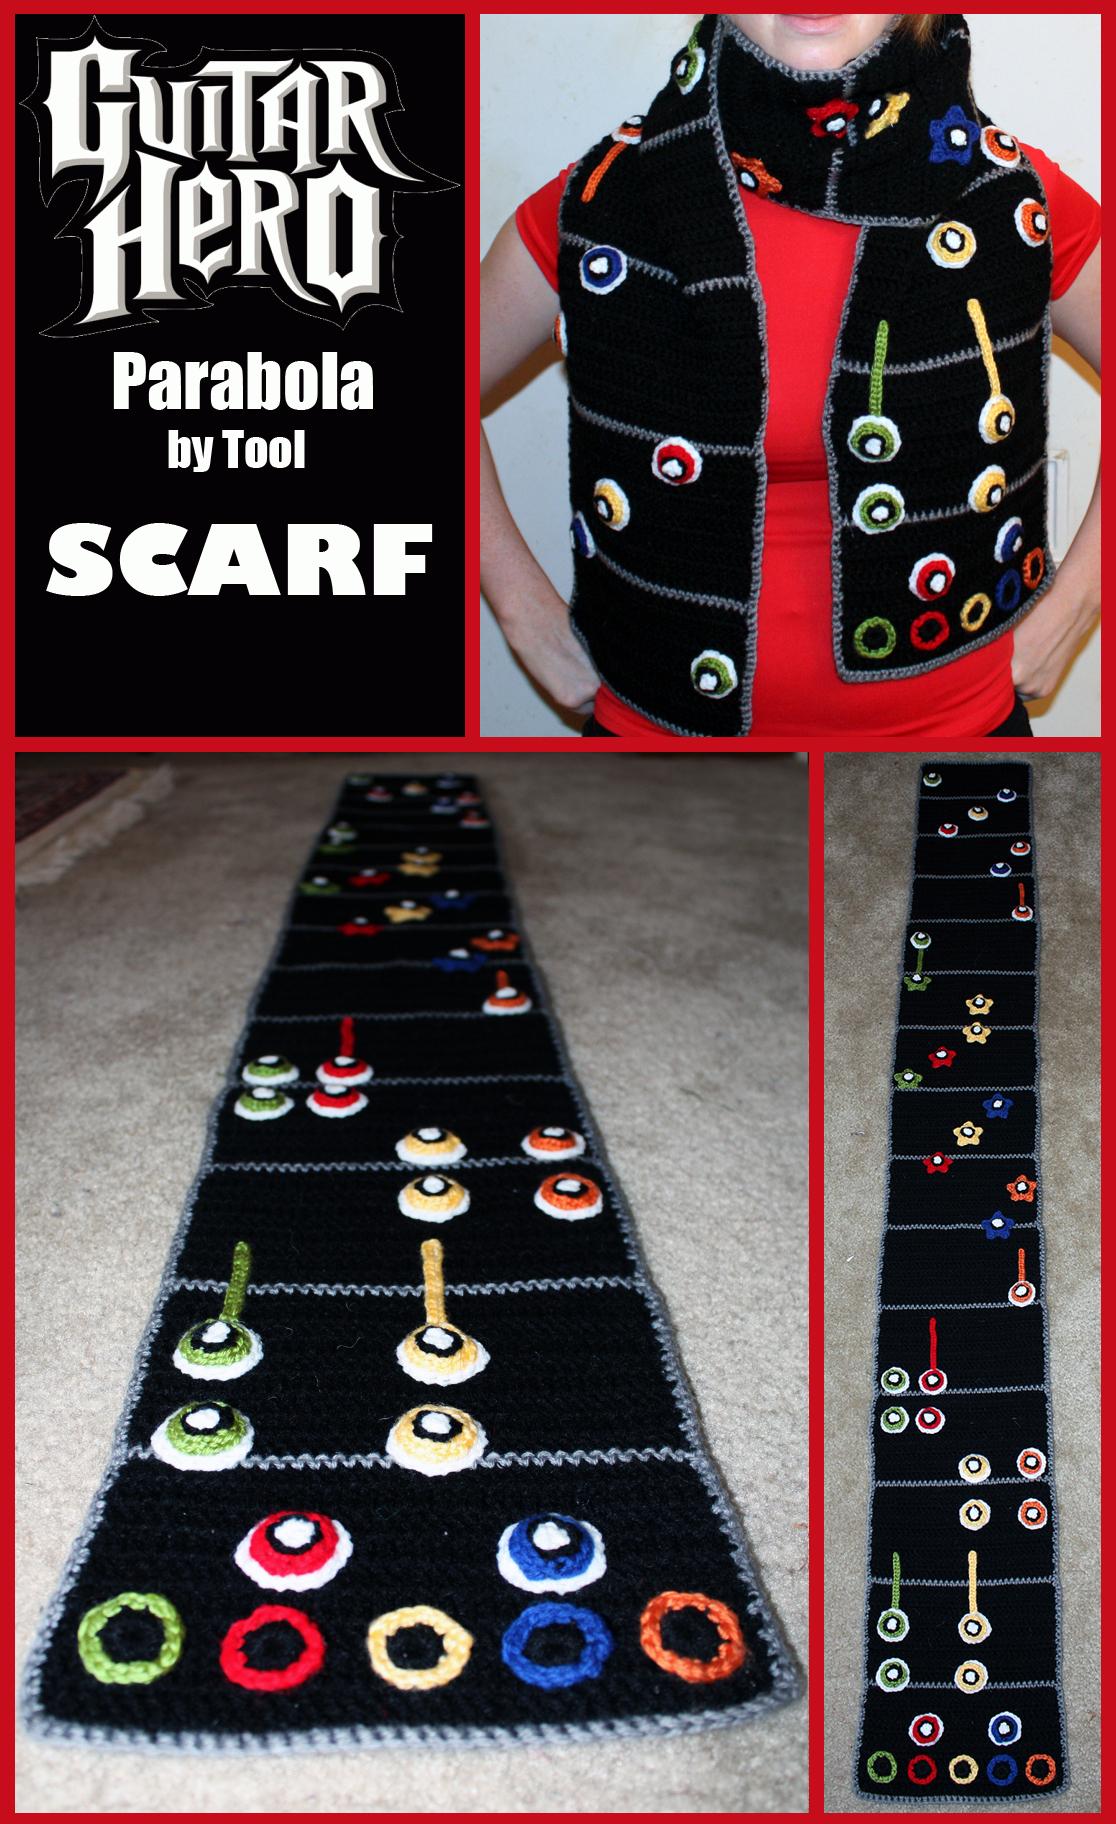 Guitar Hero Scarf by sapphiresphinx